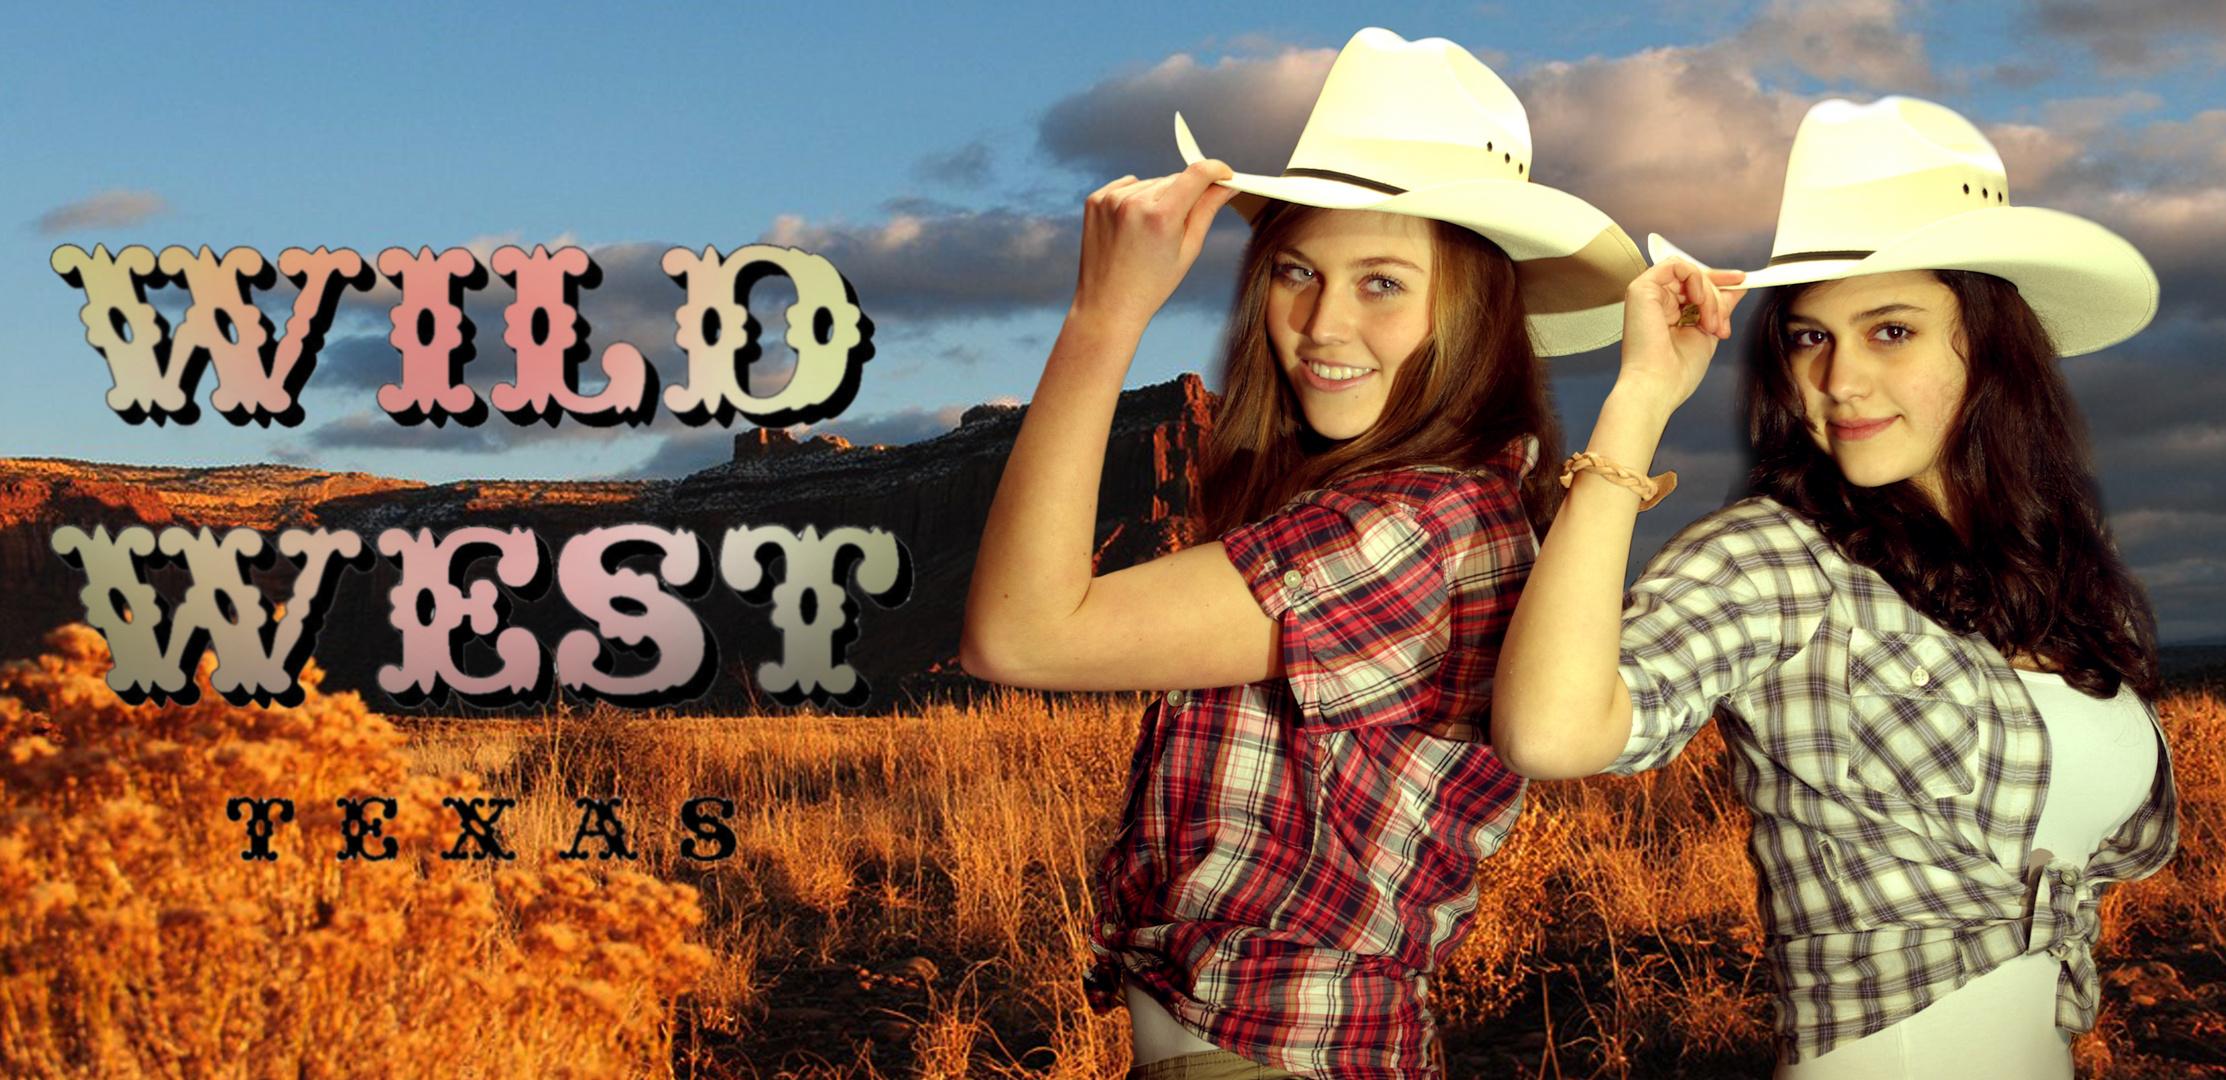 Wild West Texas